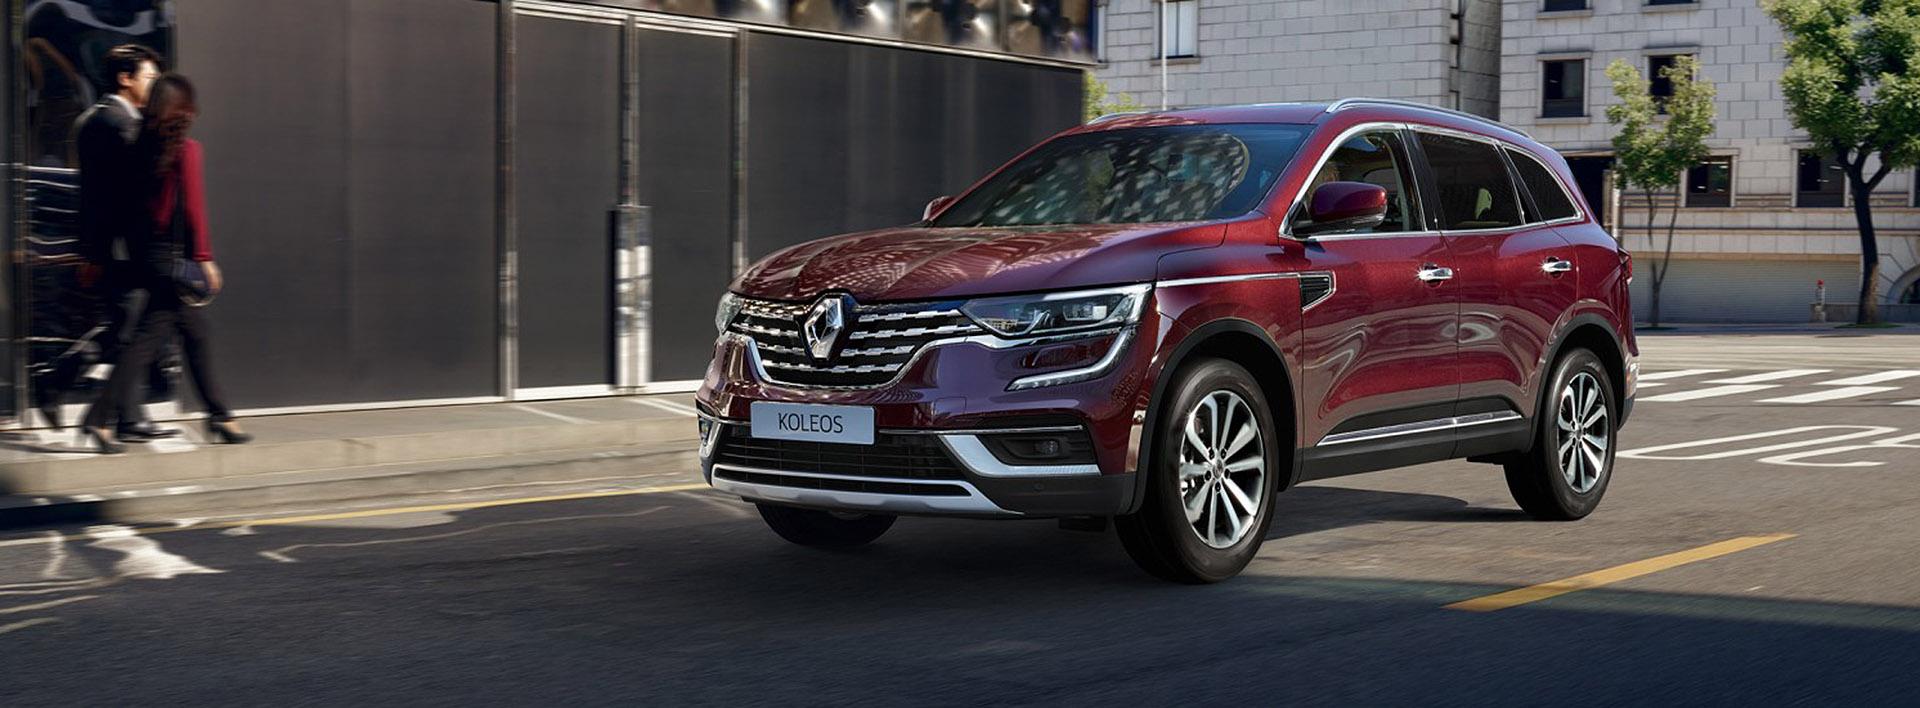 Renault New Car Range